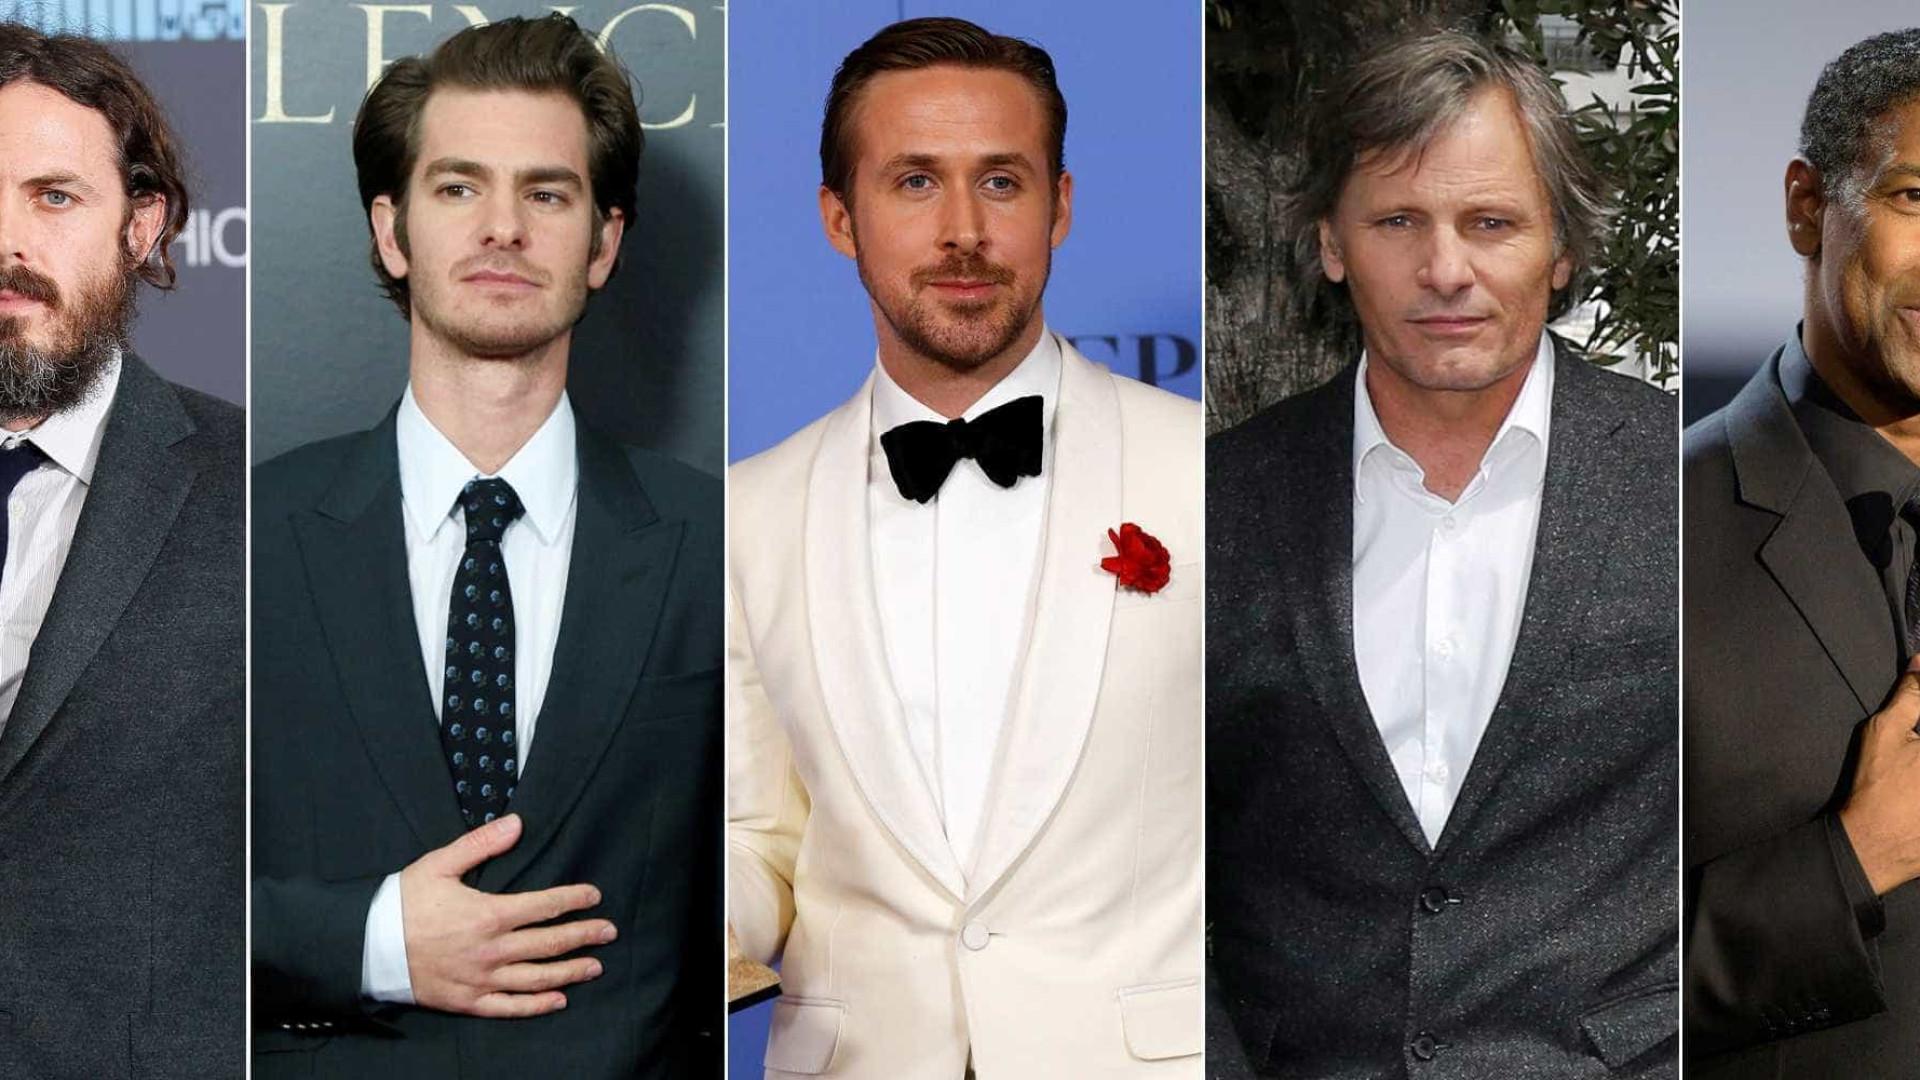 Veja a lista completa dos indicados ao Oscars 2017